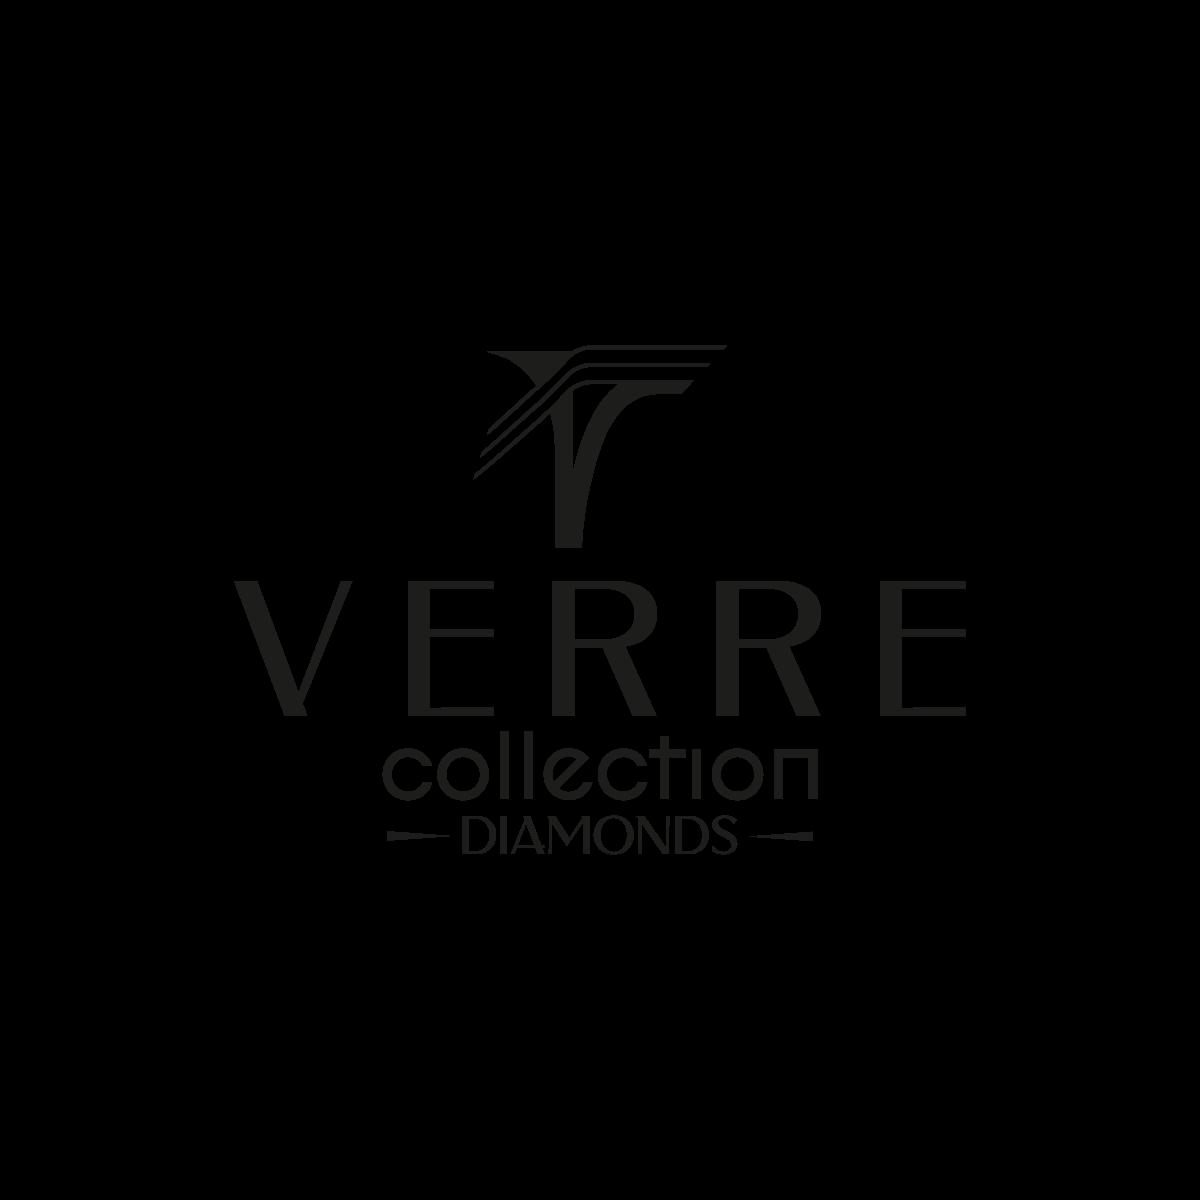 Verre Collection Diamonds